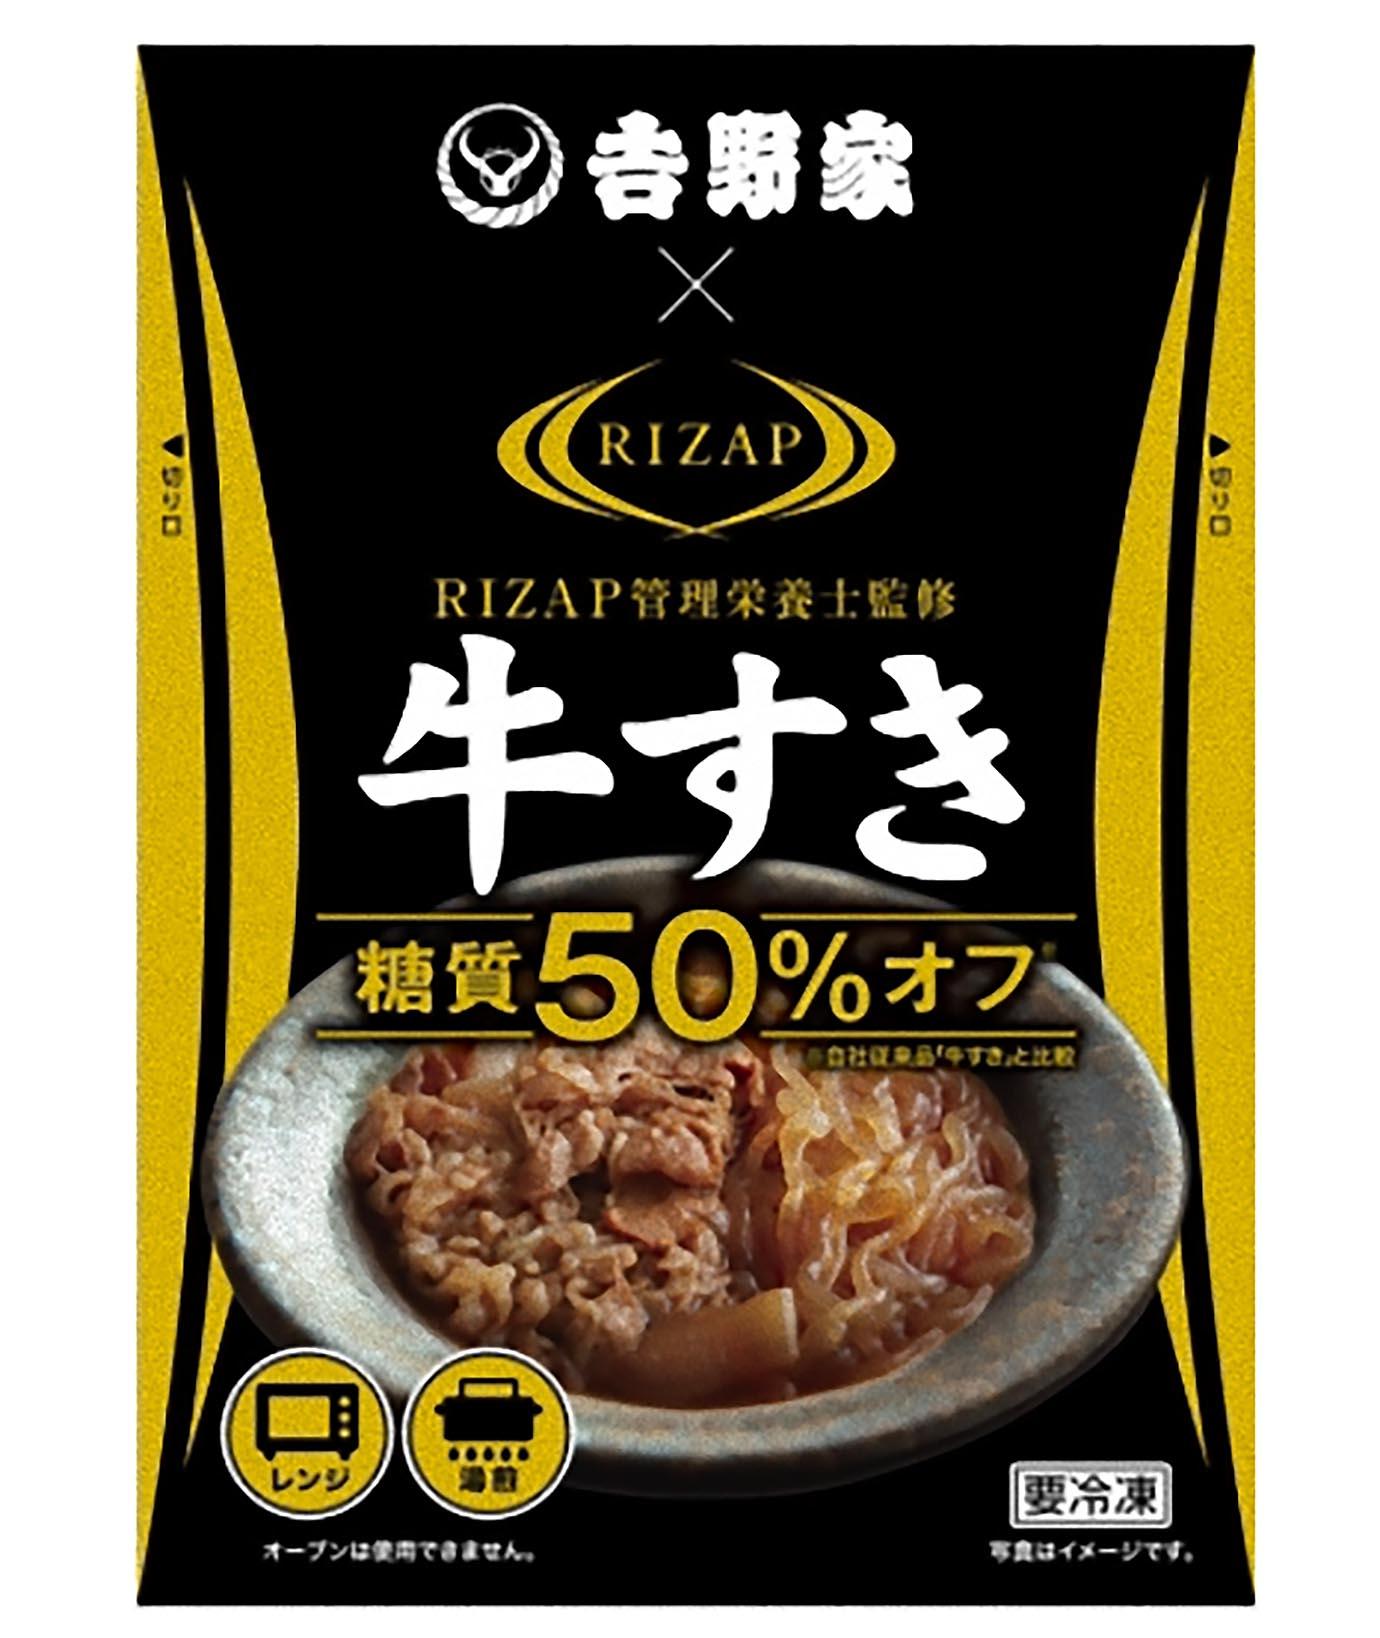 yoshonoya-rizap